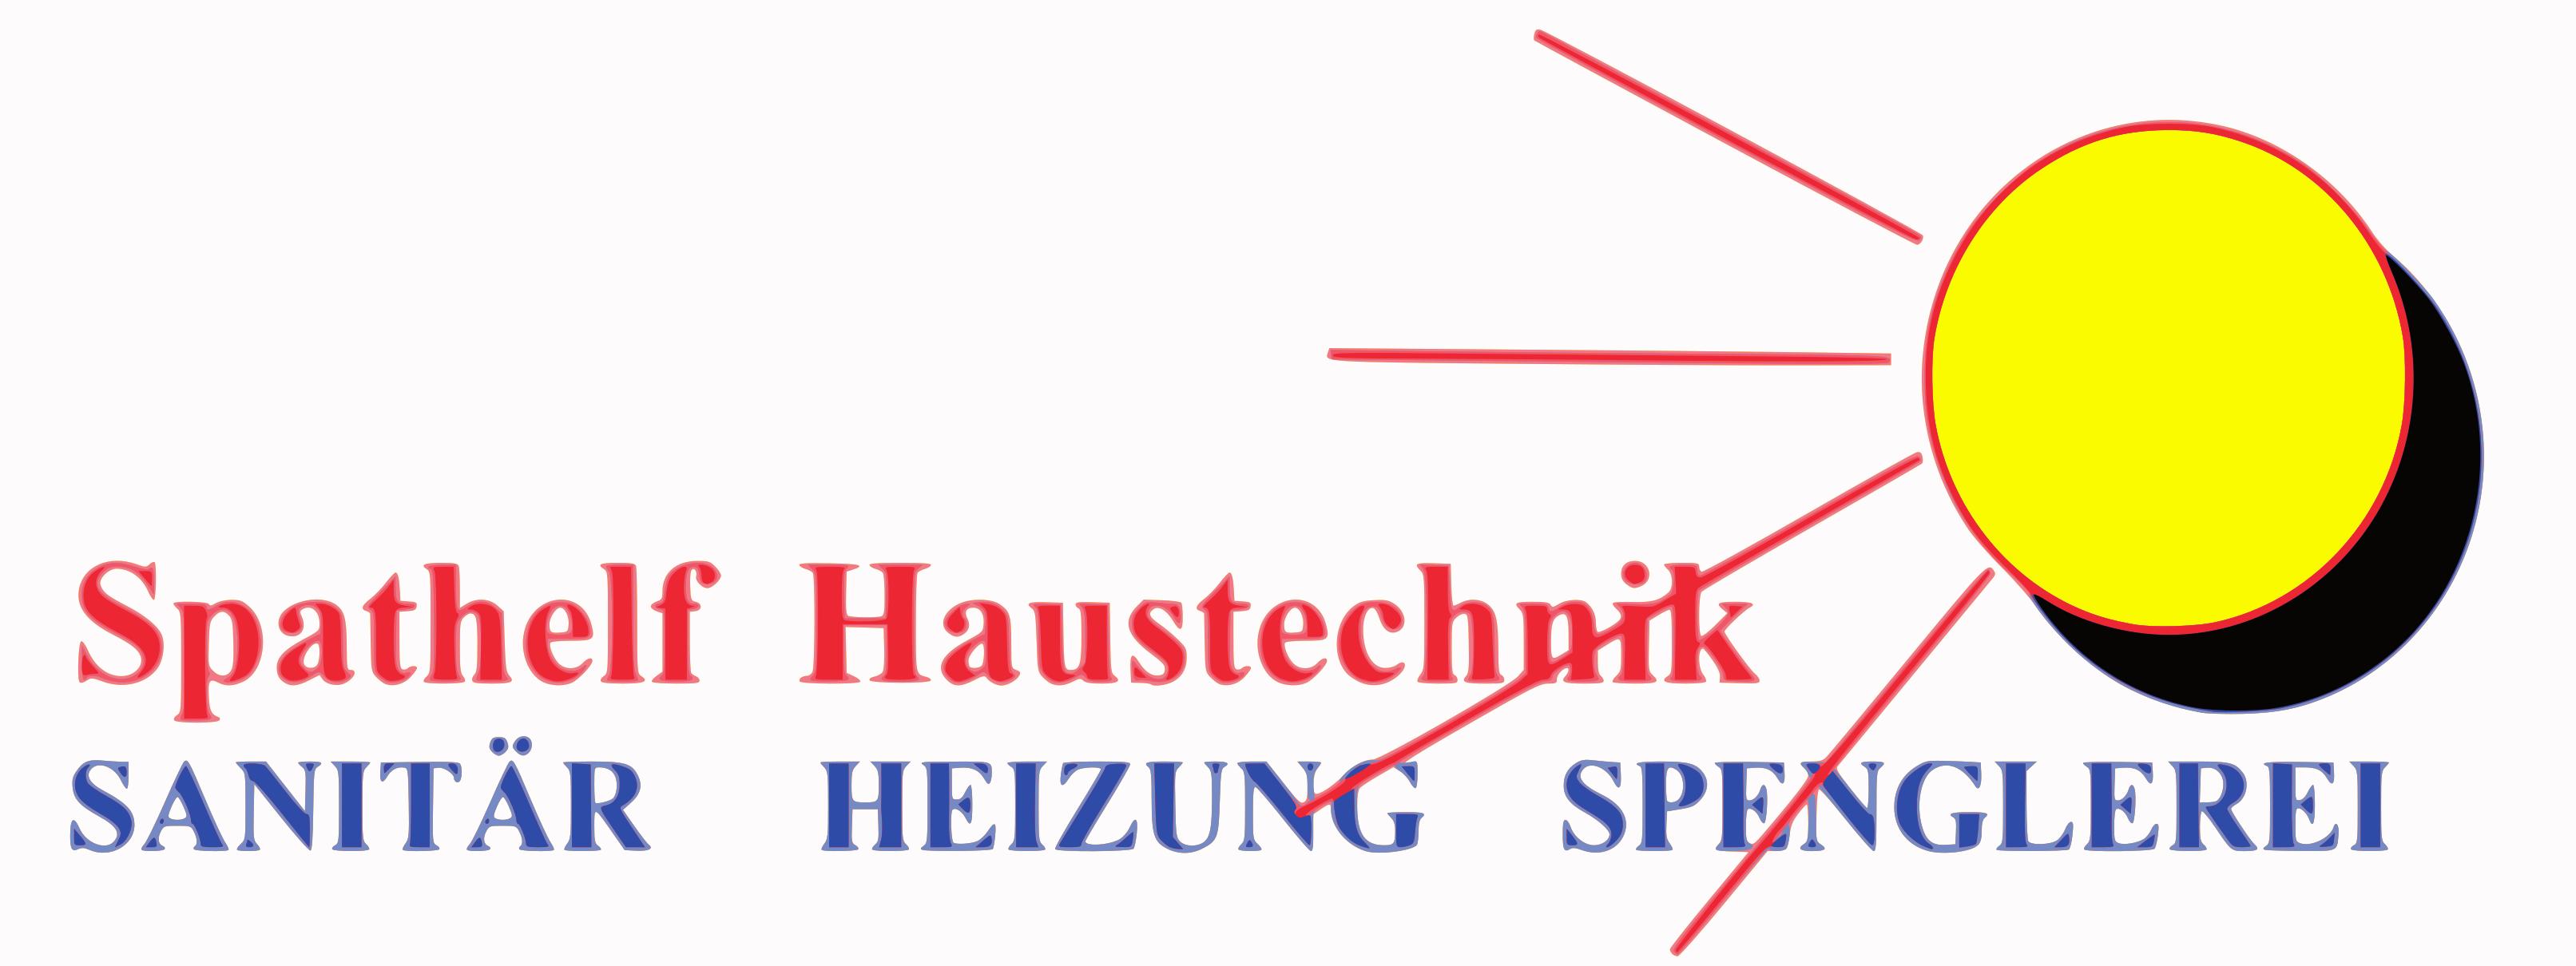 Spathelf Haustechnik | Sanitär | Heizung | Spenglerei | Basel